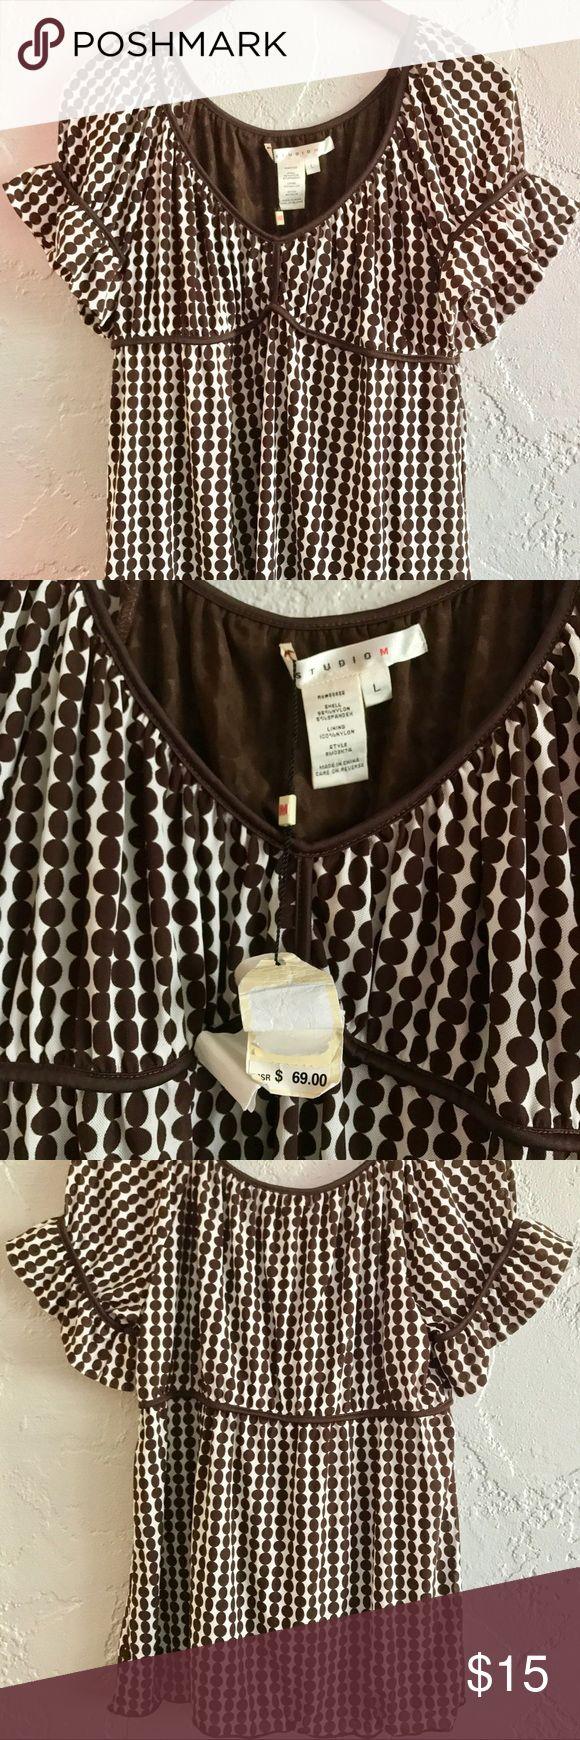 Studio M Women's Polka Dot Shirt Size L *NWT* $69 Studio M Women's Polka Dotted Shirt Size L *NWT*, retails for $69 Studio M Tops Blouses